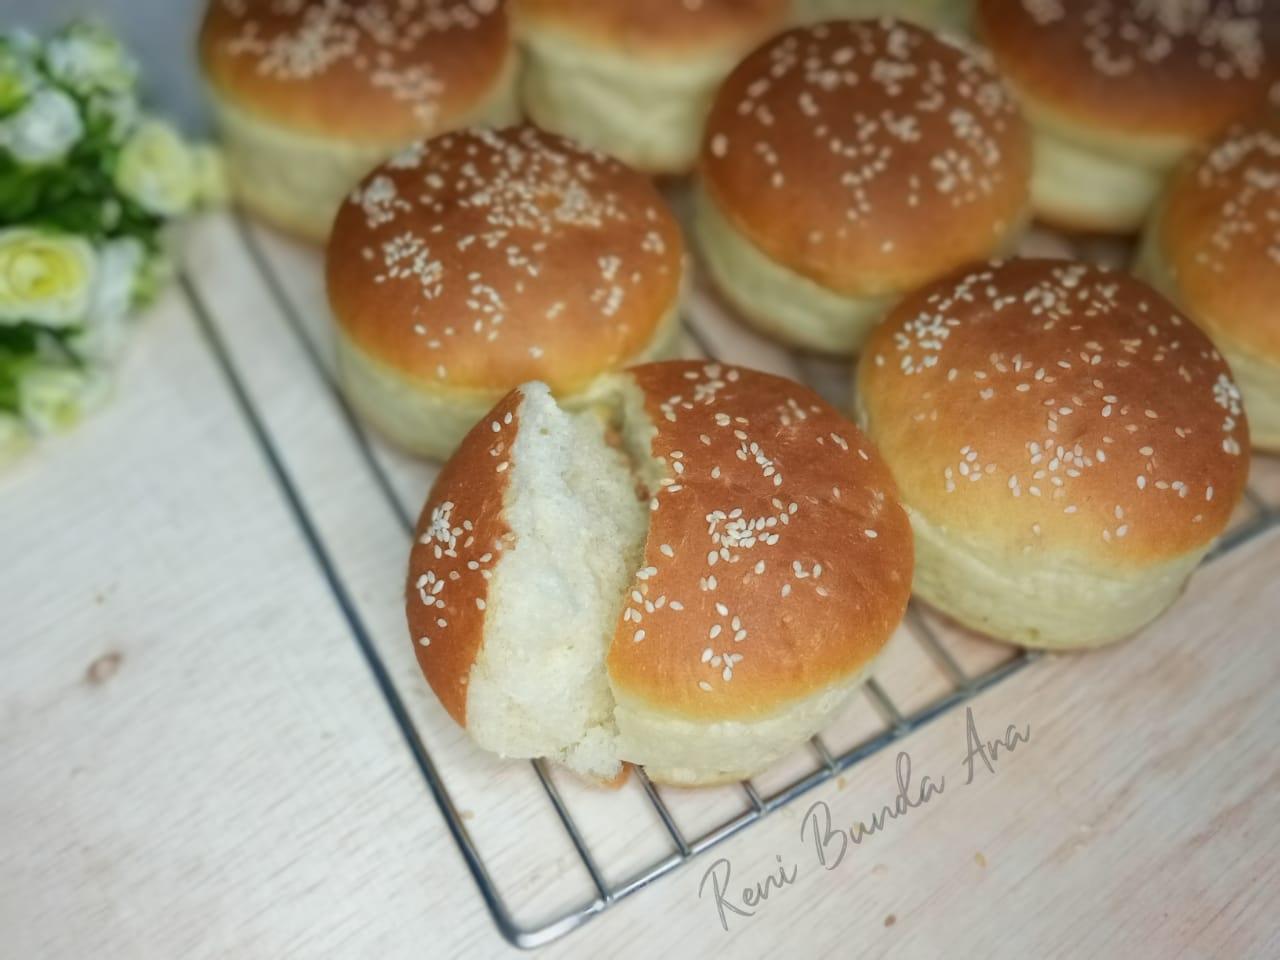 Roti burger by Reni Dwi Arti Agustina 1